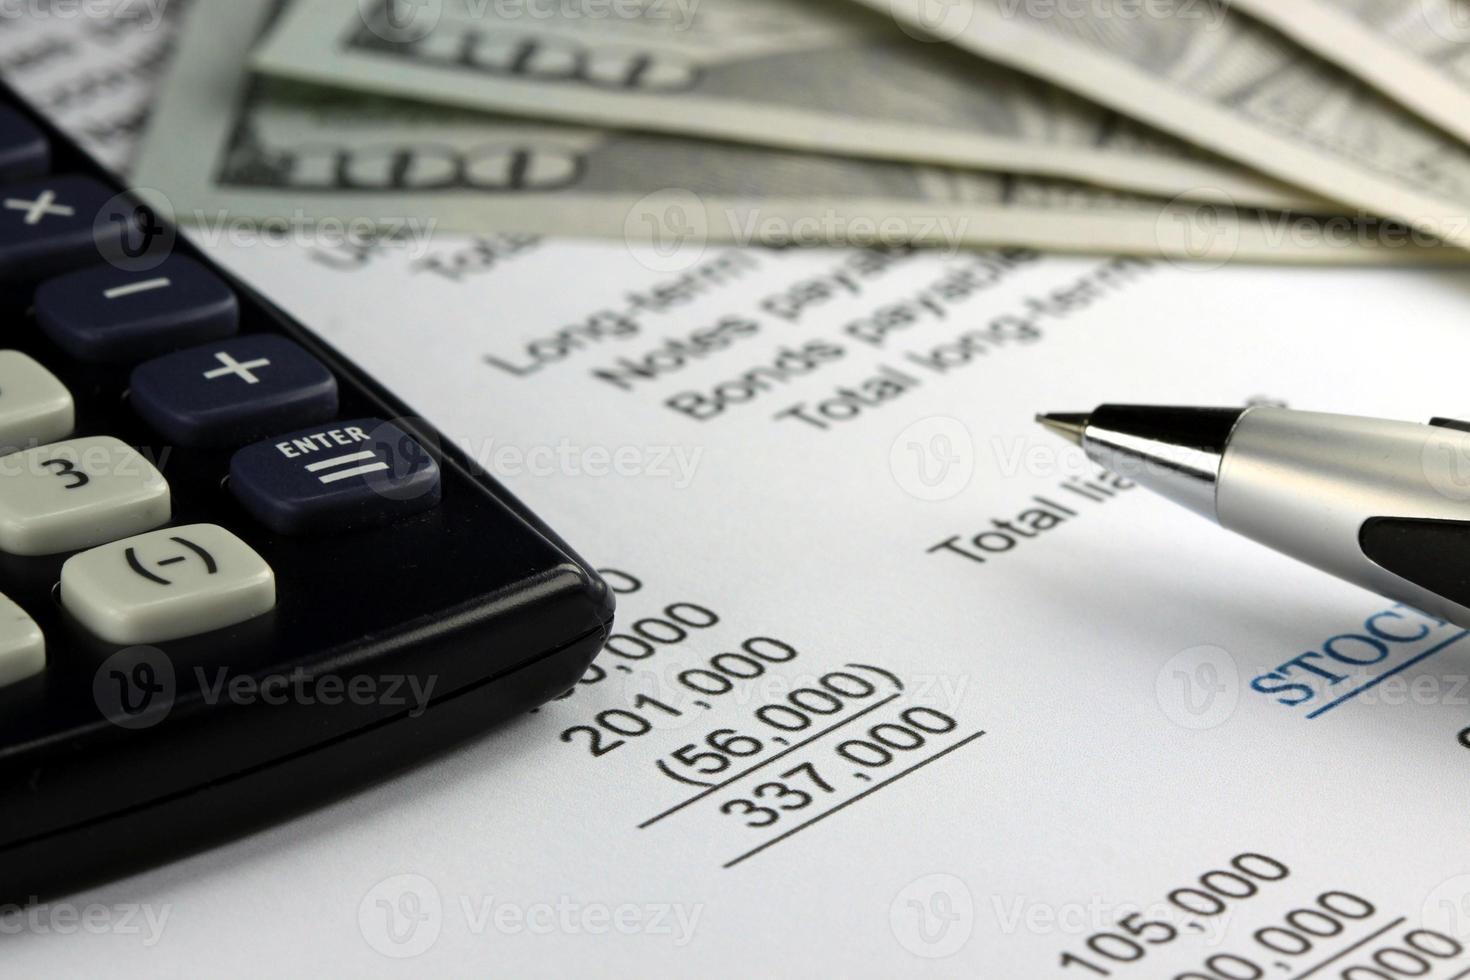 ons valuta, rekenmachine en financiële documenten close-up foto